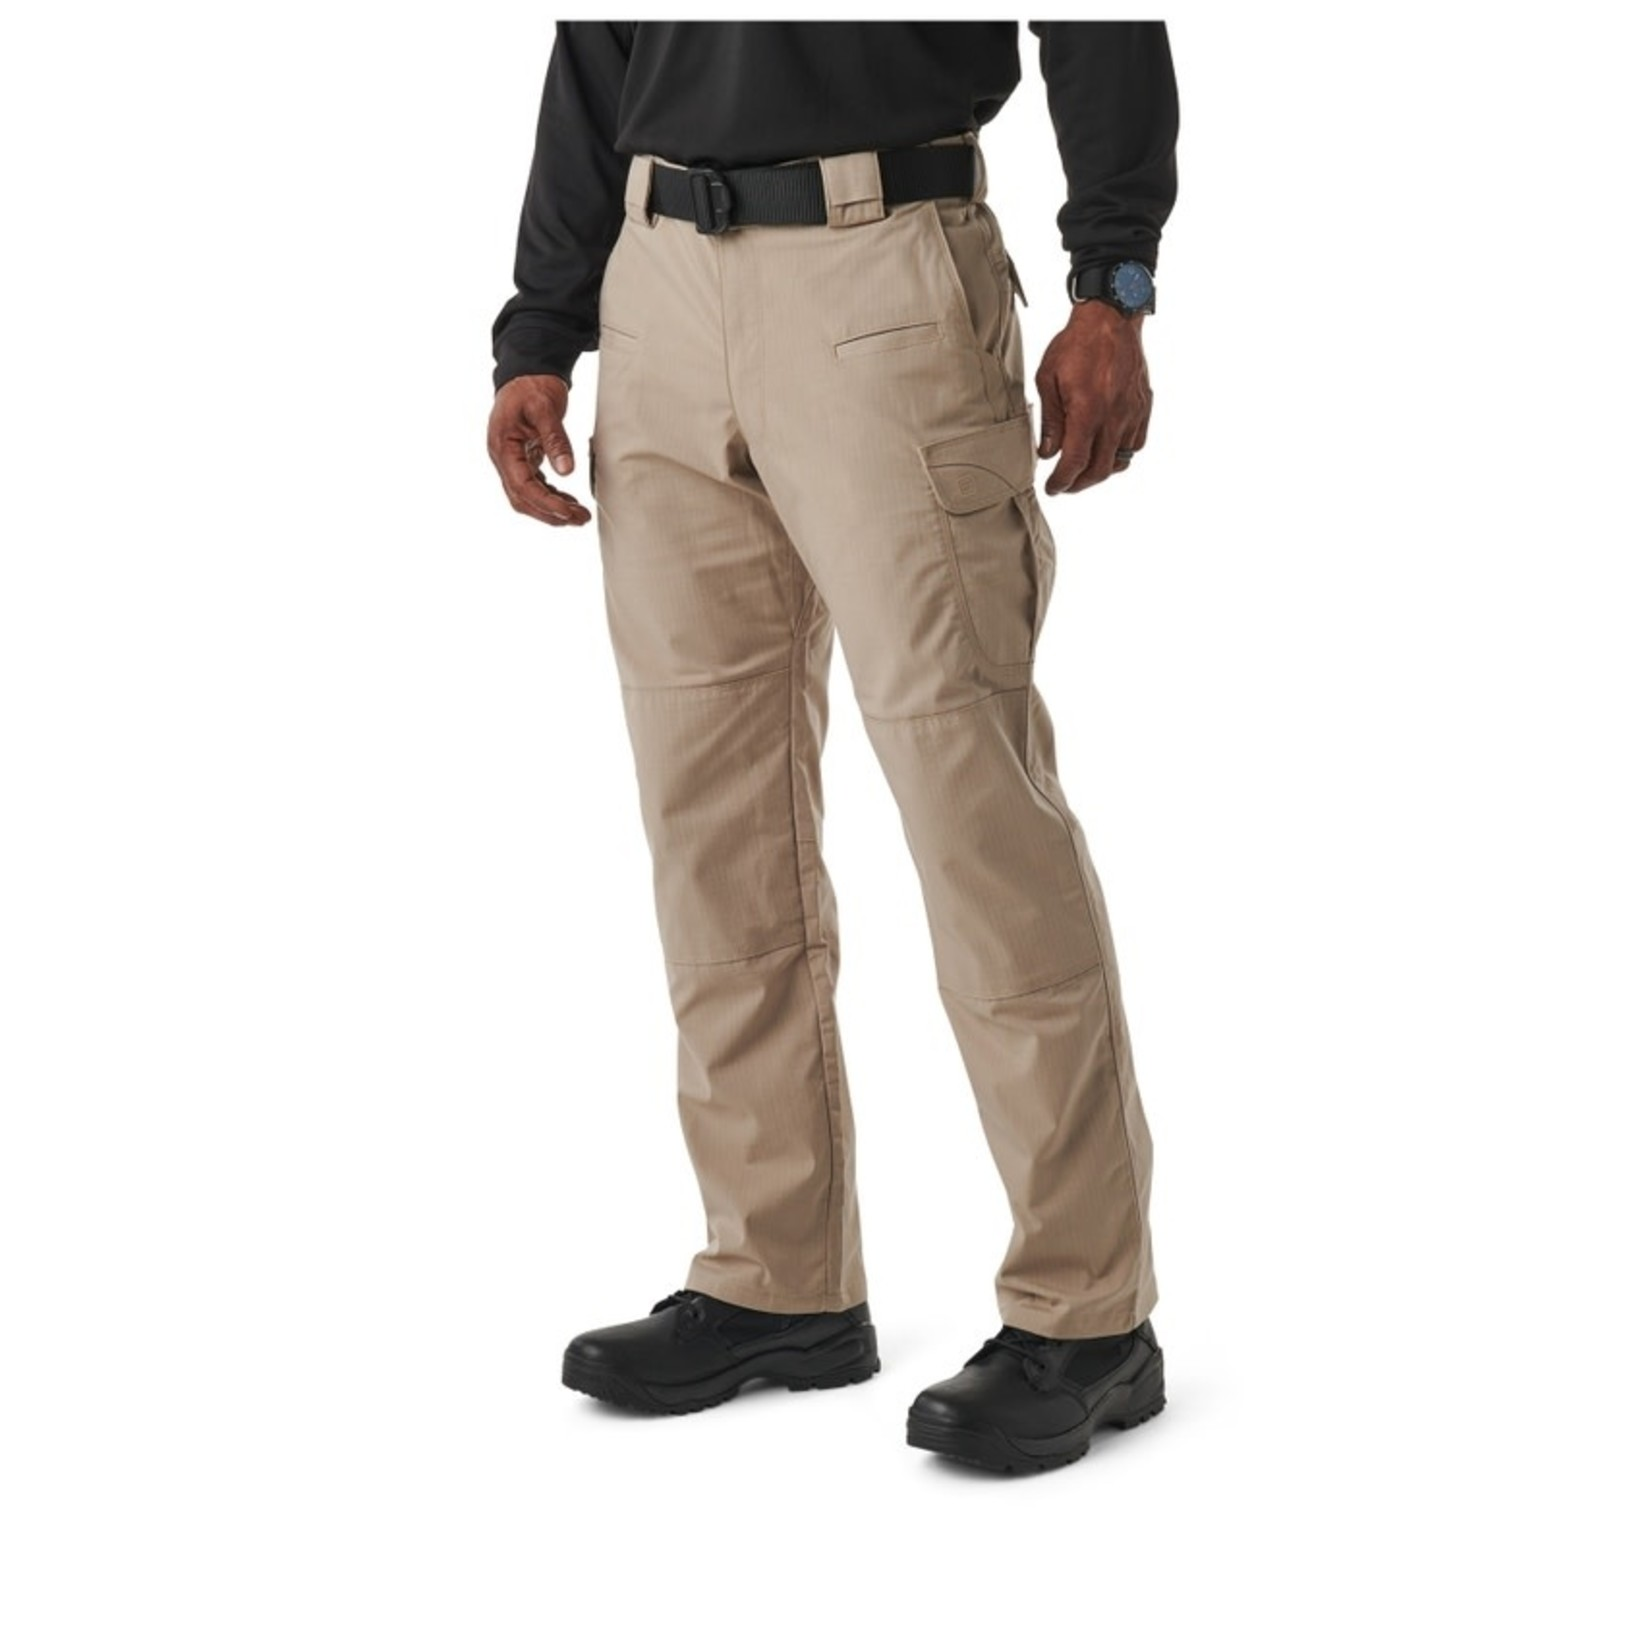 5.11 Tactical 5.11 Men's Stryke Pants